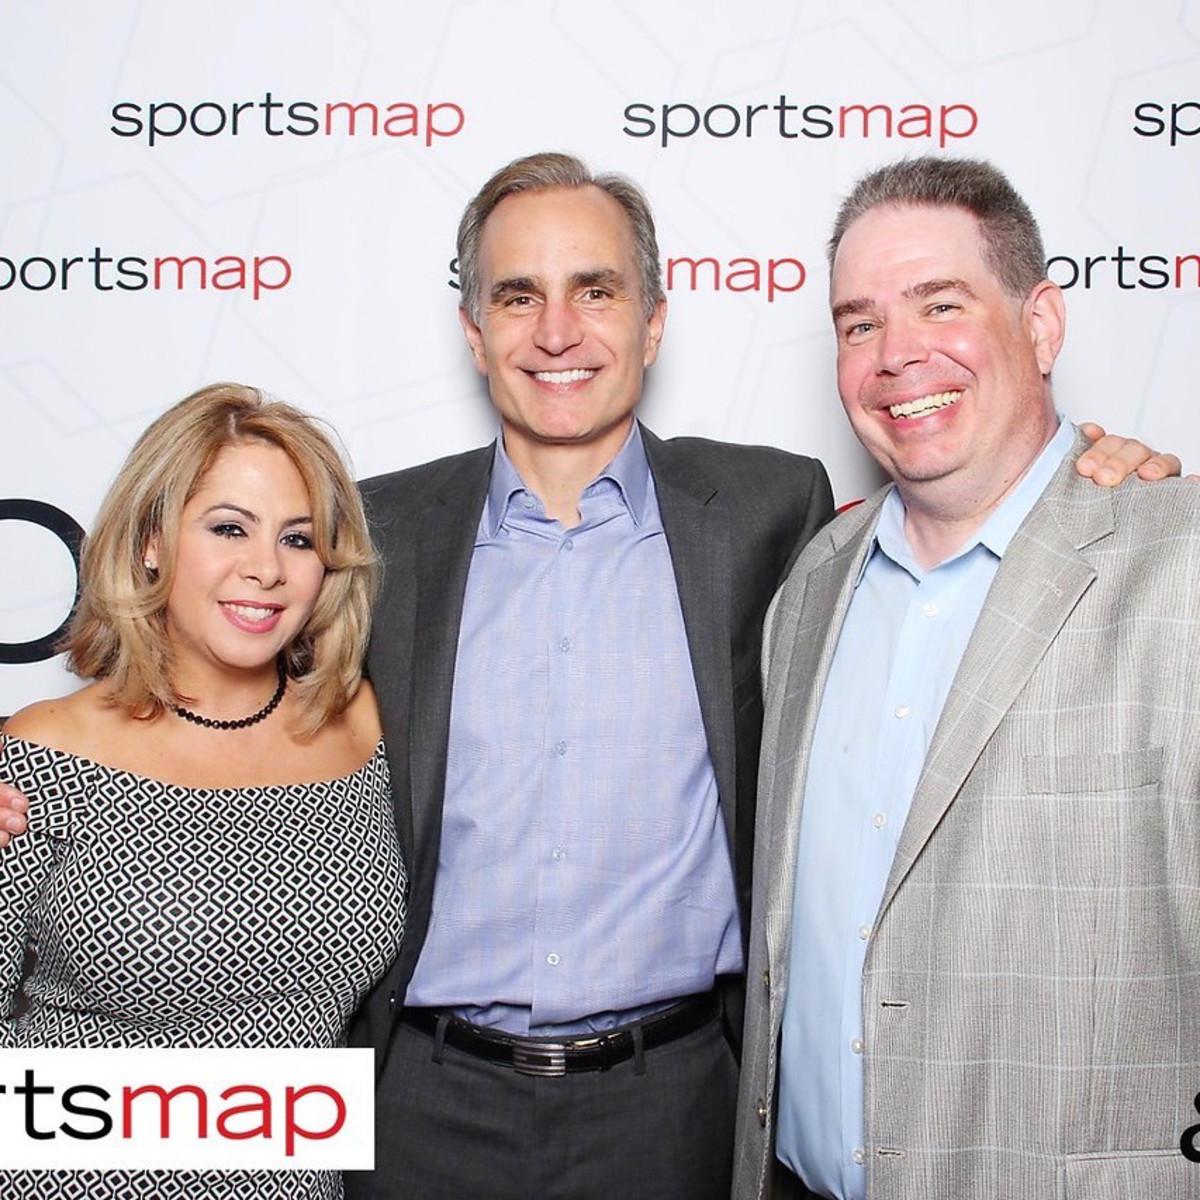 SportsMap launch party, Esmeralda Perez, David Gow, Craig Larson, October 2017